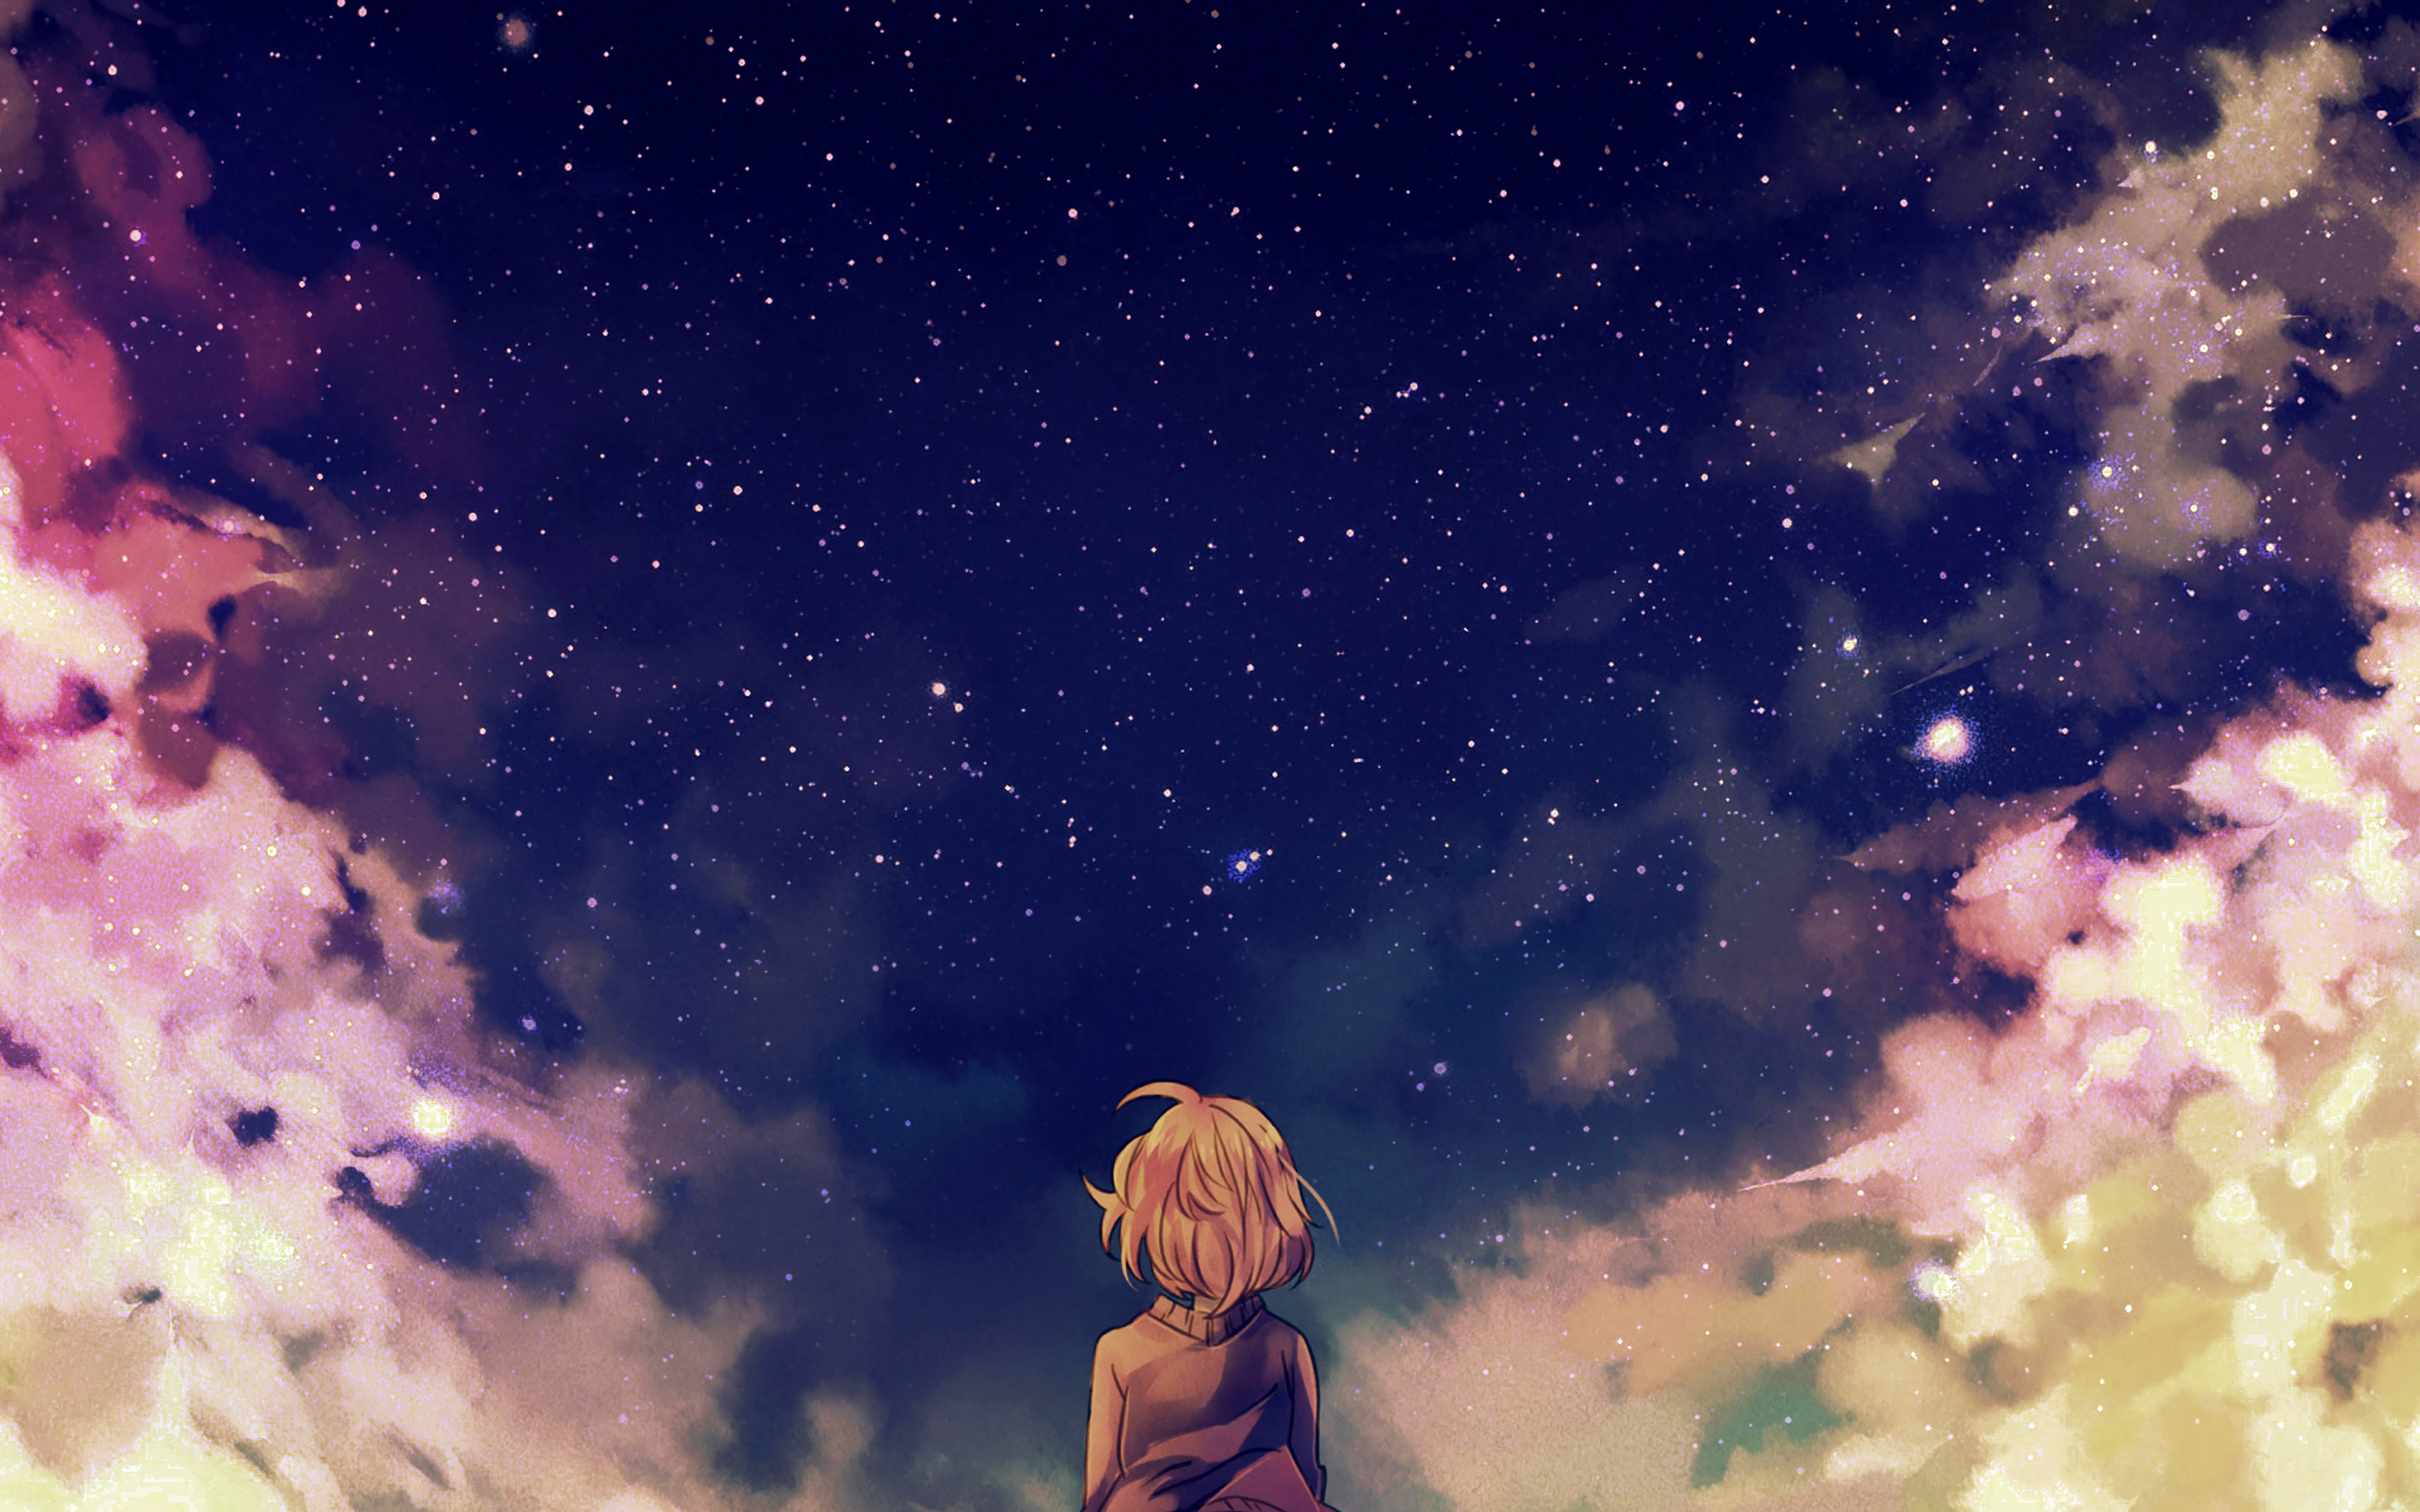 ad65-starry-space-illust-anime-girl-wallpaper